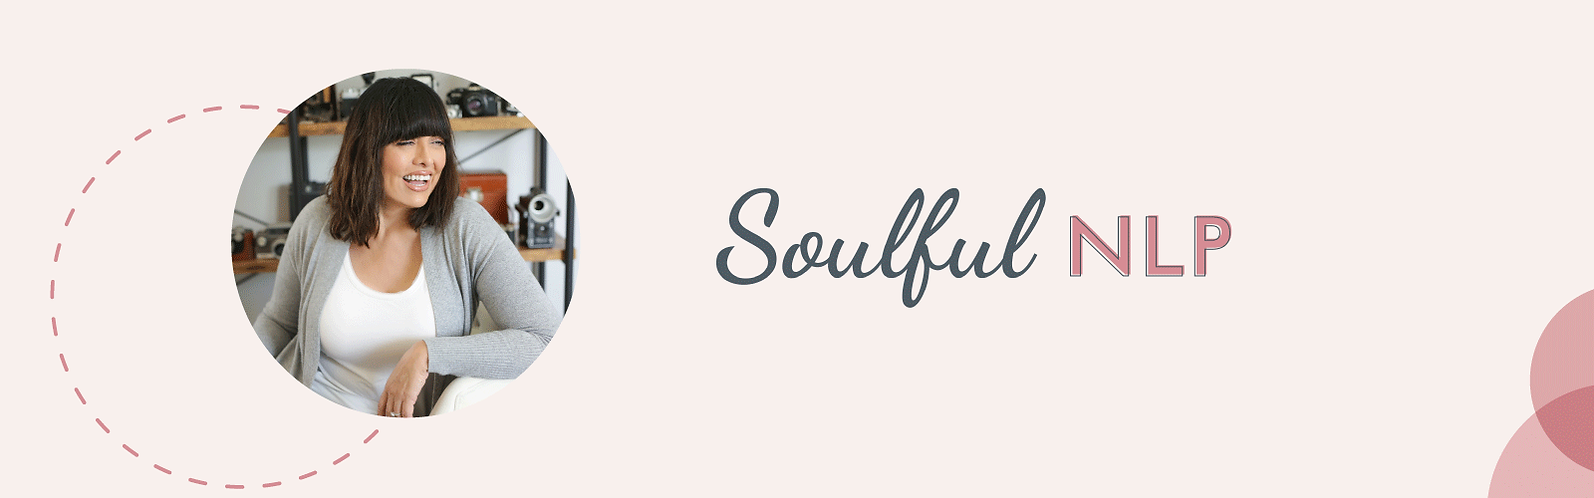 soulful nlp brand identity